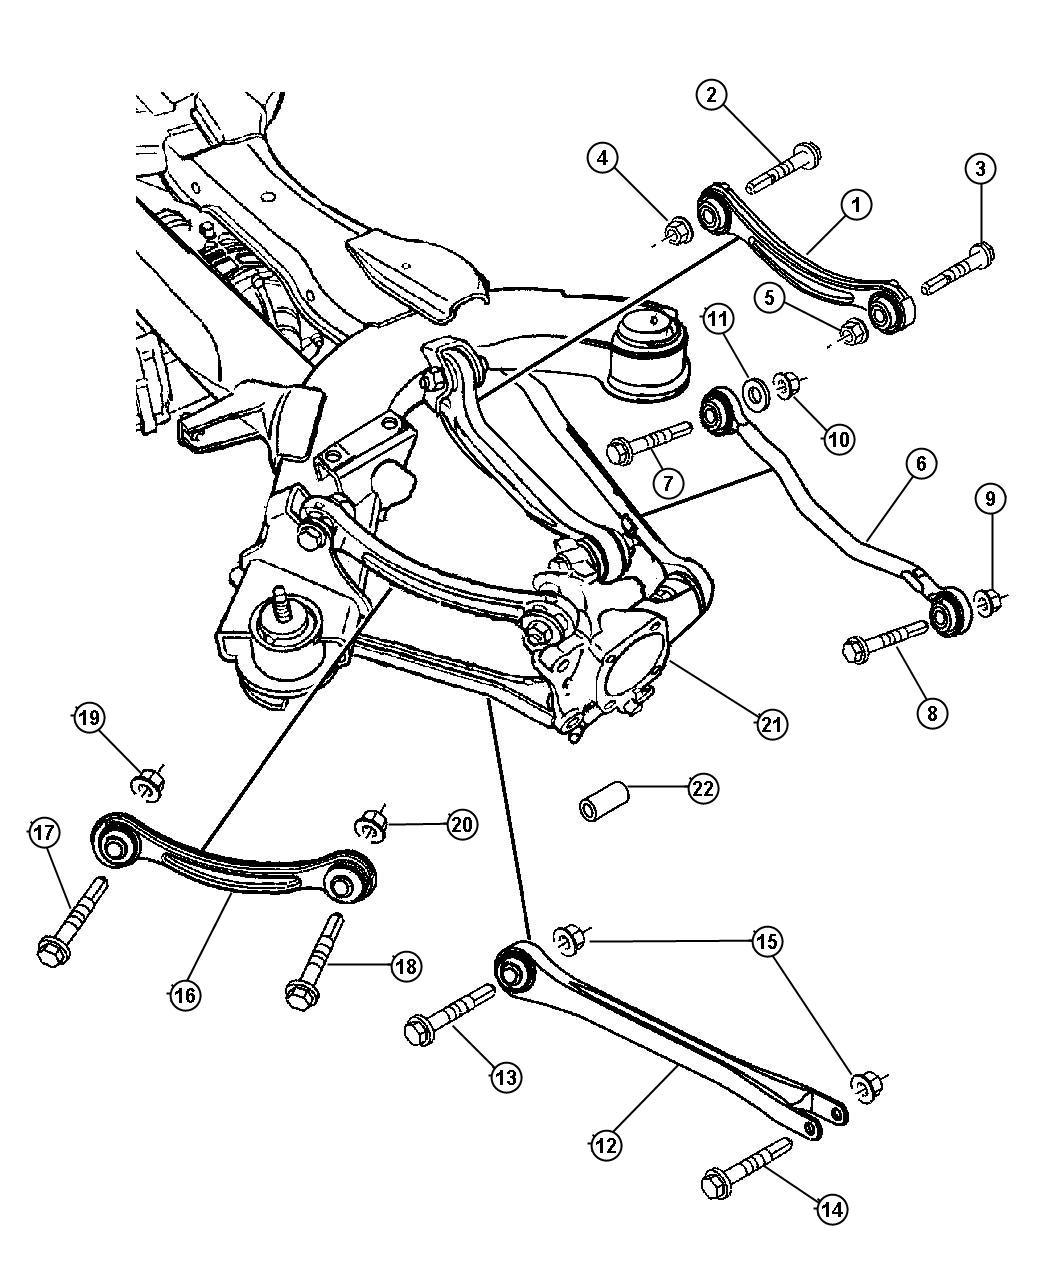 2004 Chrysler Pacifica Toe link. Suspension, rear